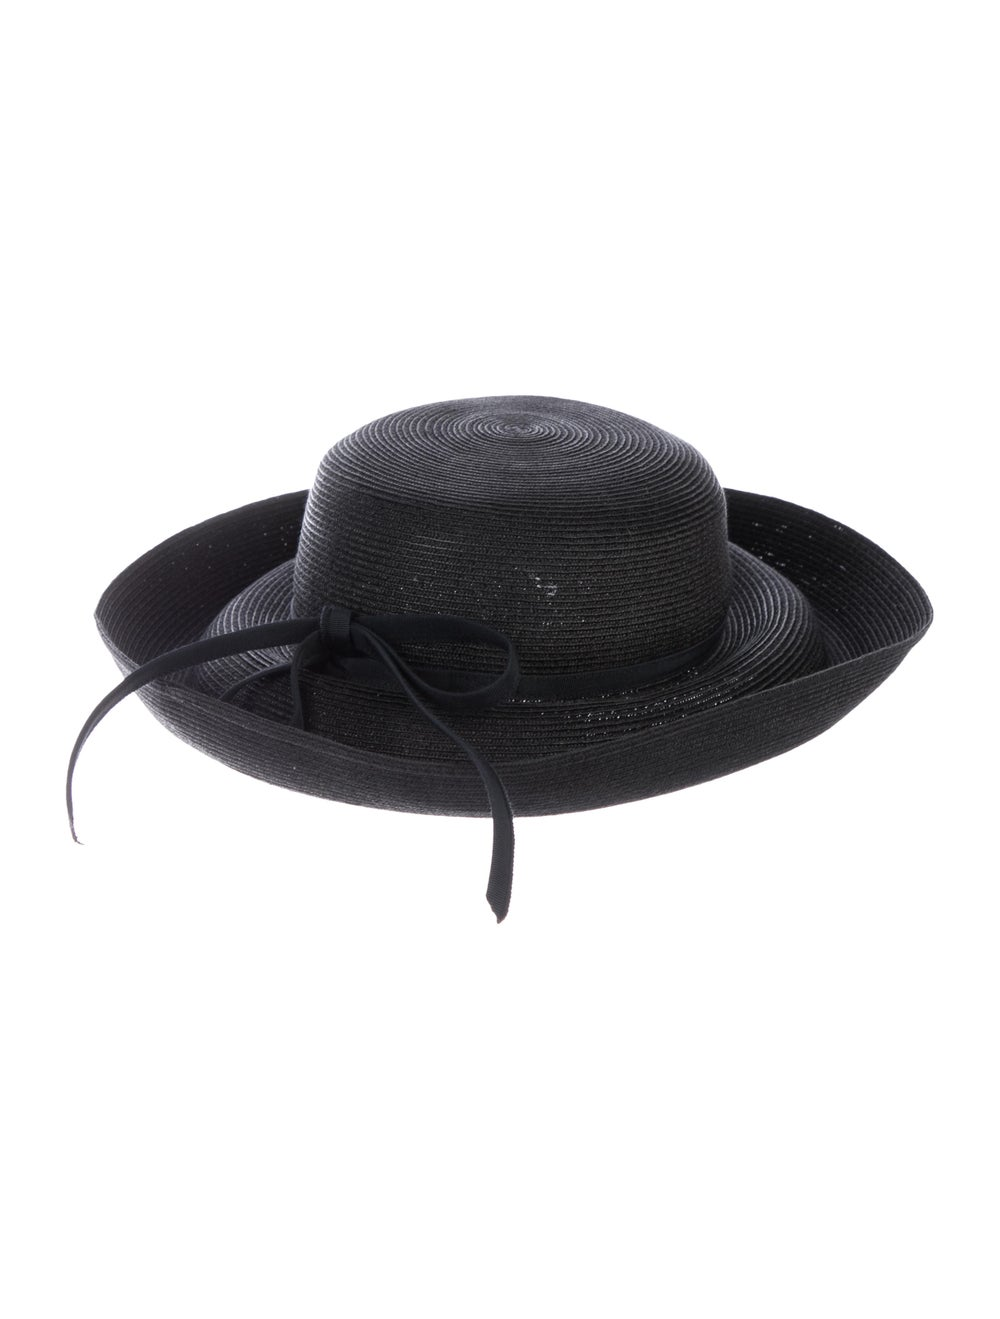 Eric Javits Hampton Straw Hat w/ Tags Black - image 2